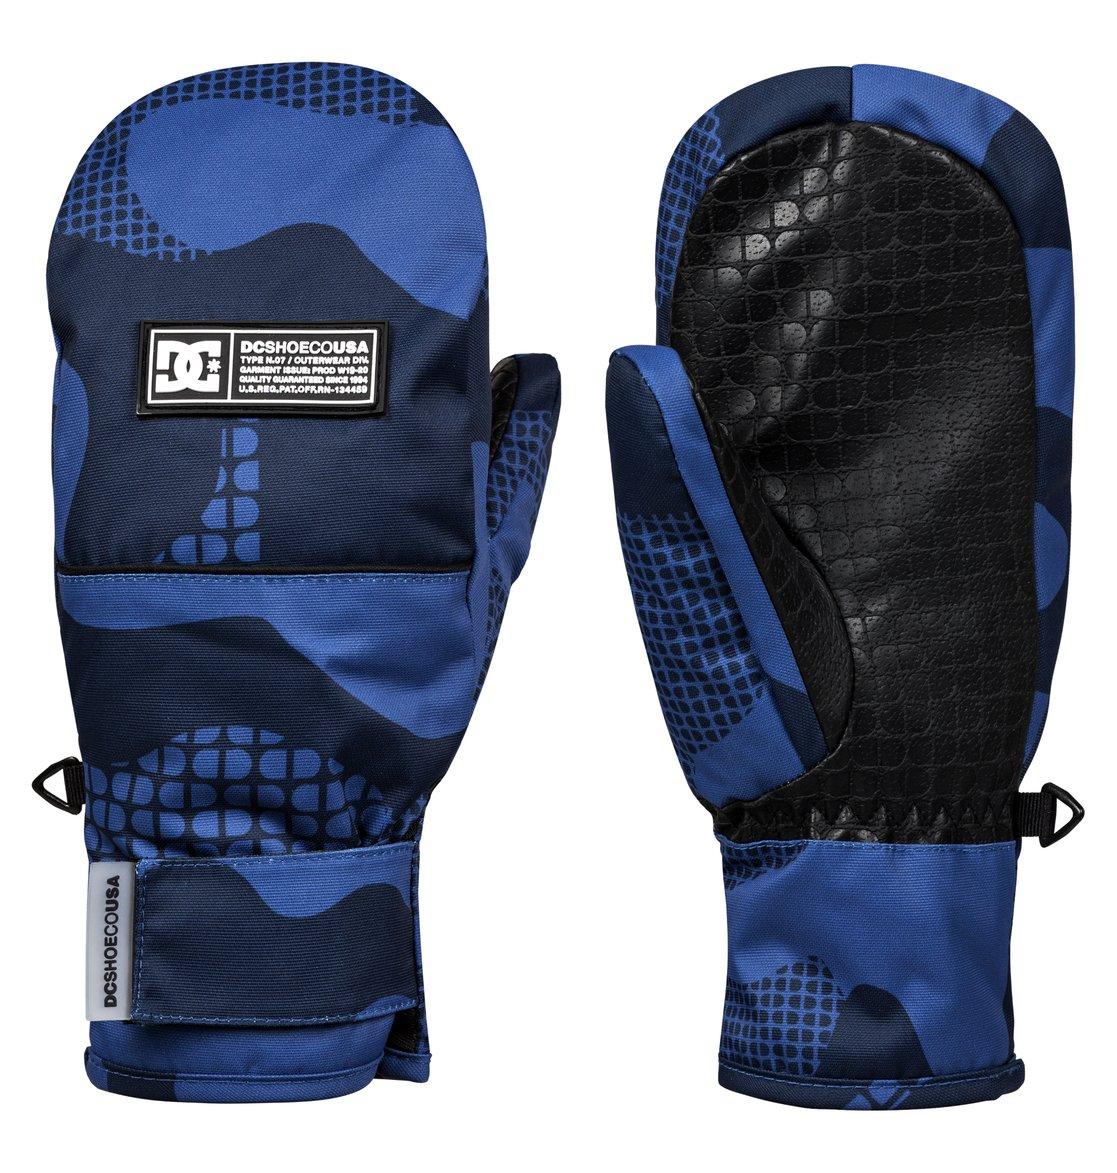 DC Shoes Snowboardhandschuhe Franchise | Accessoires > Handschuhe > Sonstige Handschuhe | Dc Shoes